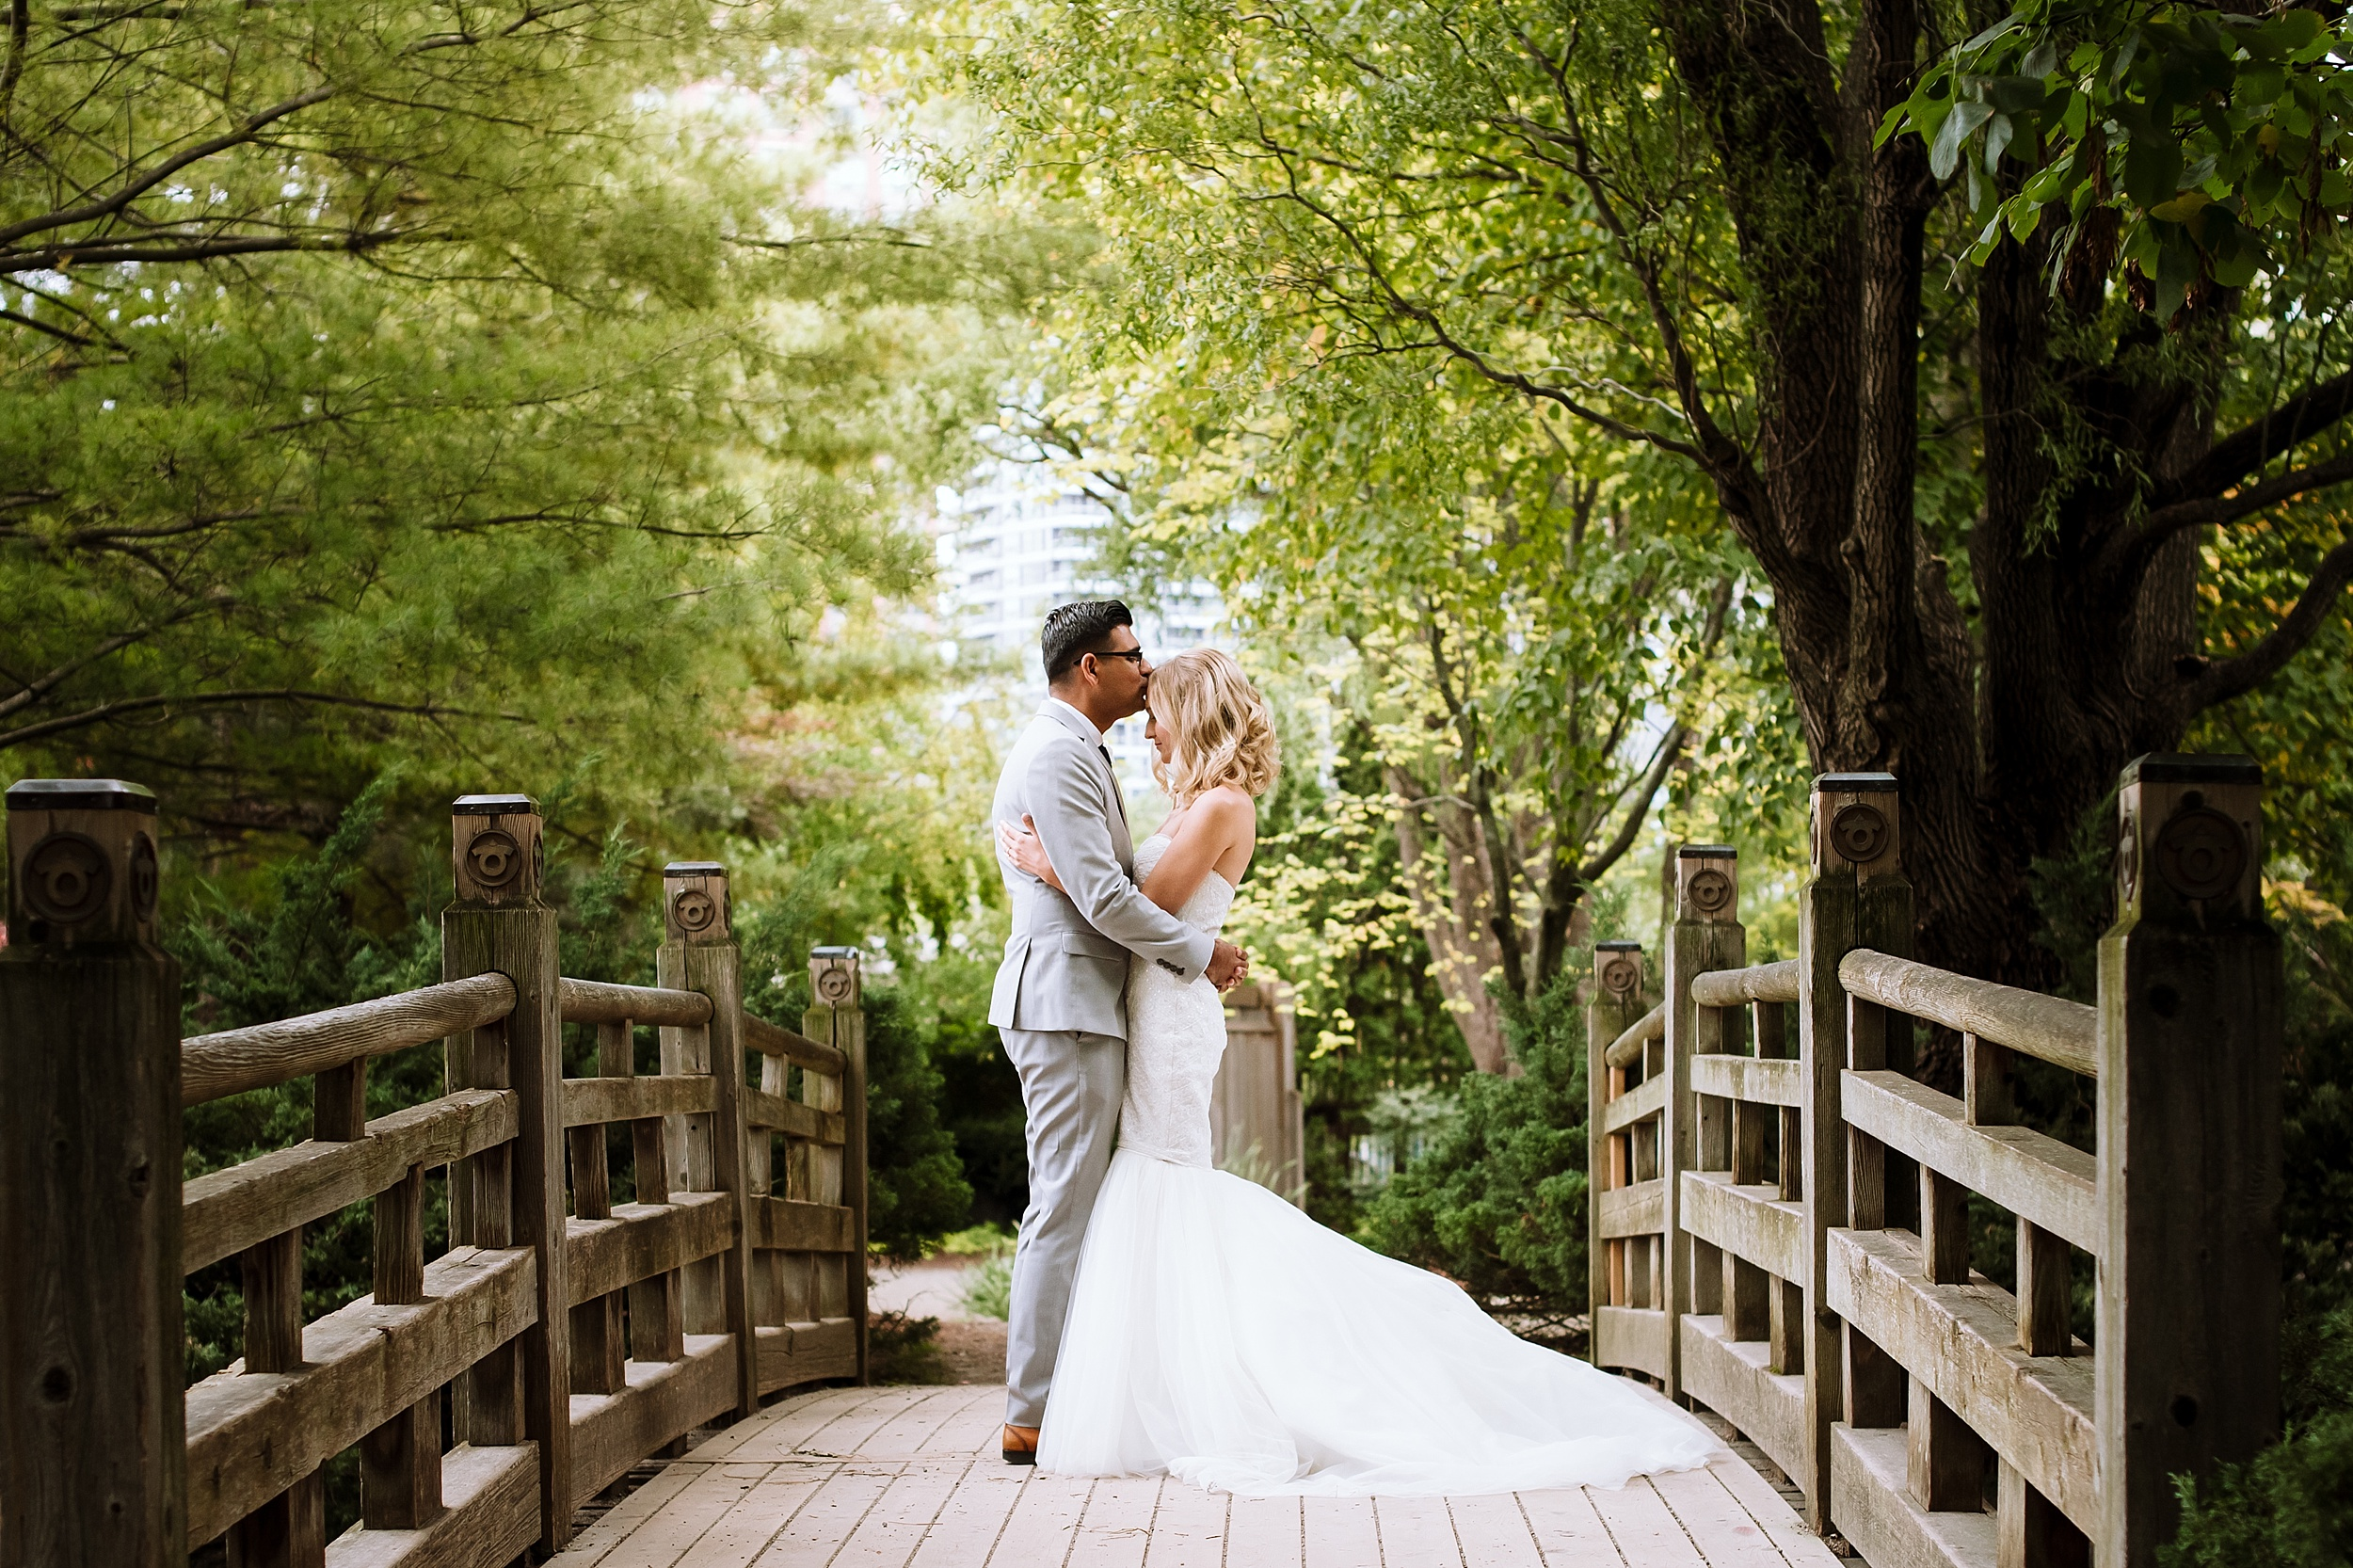 Kariya_Park_Wedding_Shoot_Toronto_Photographer_0045.jpg